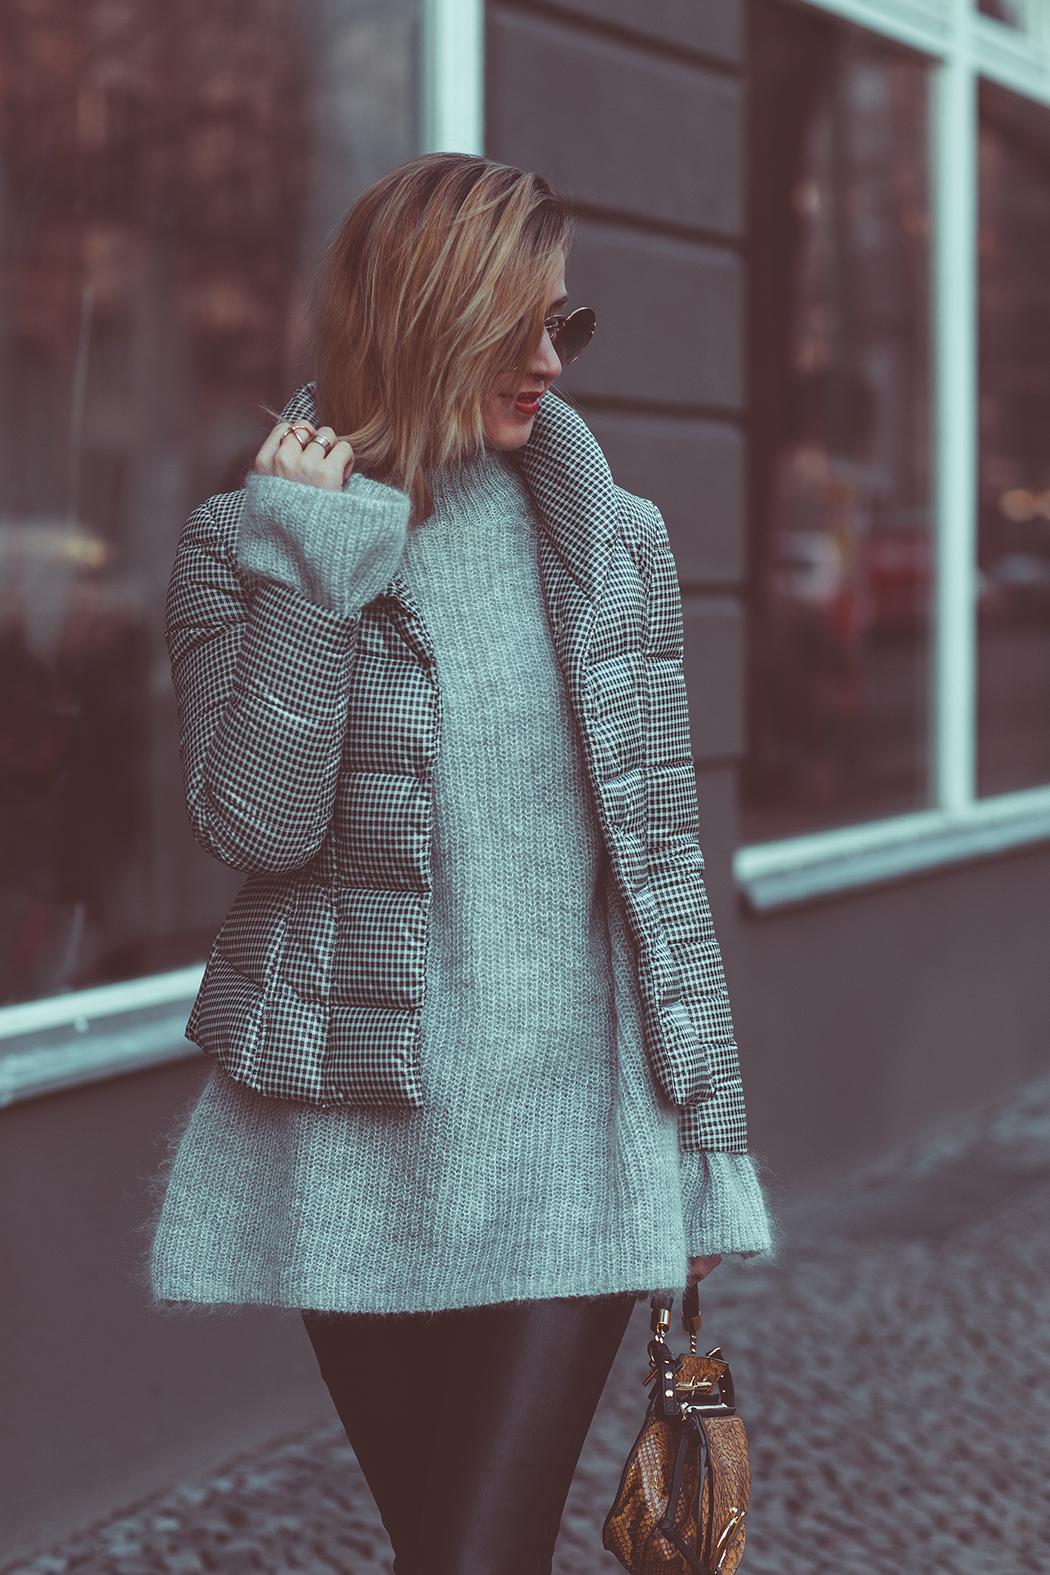 Fashionblog-Fashionblogger-Fashion-Blog-Blogger-Fashion-Week-Berlin-2017-Streetstyle-Lindarella-9-web